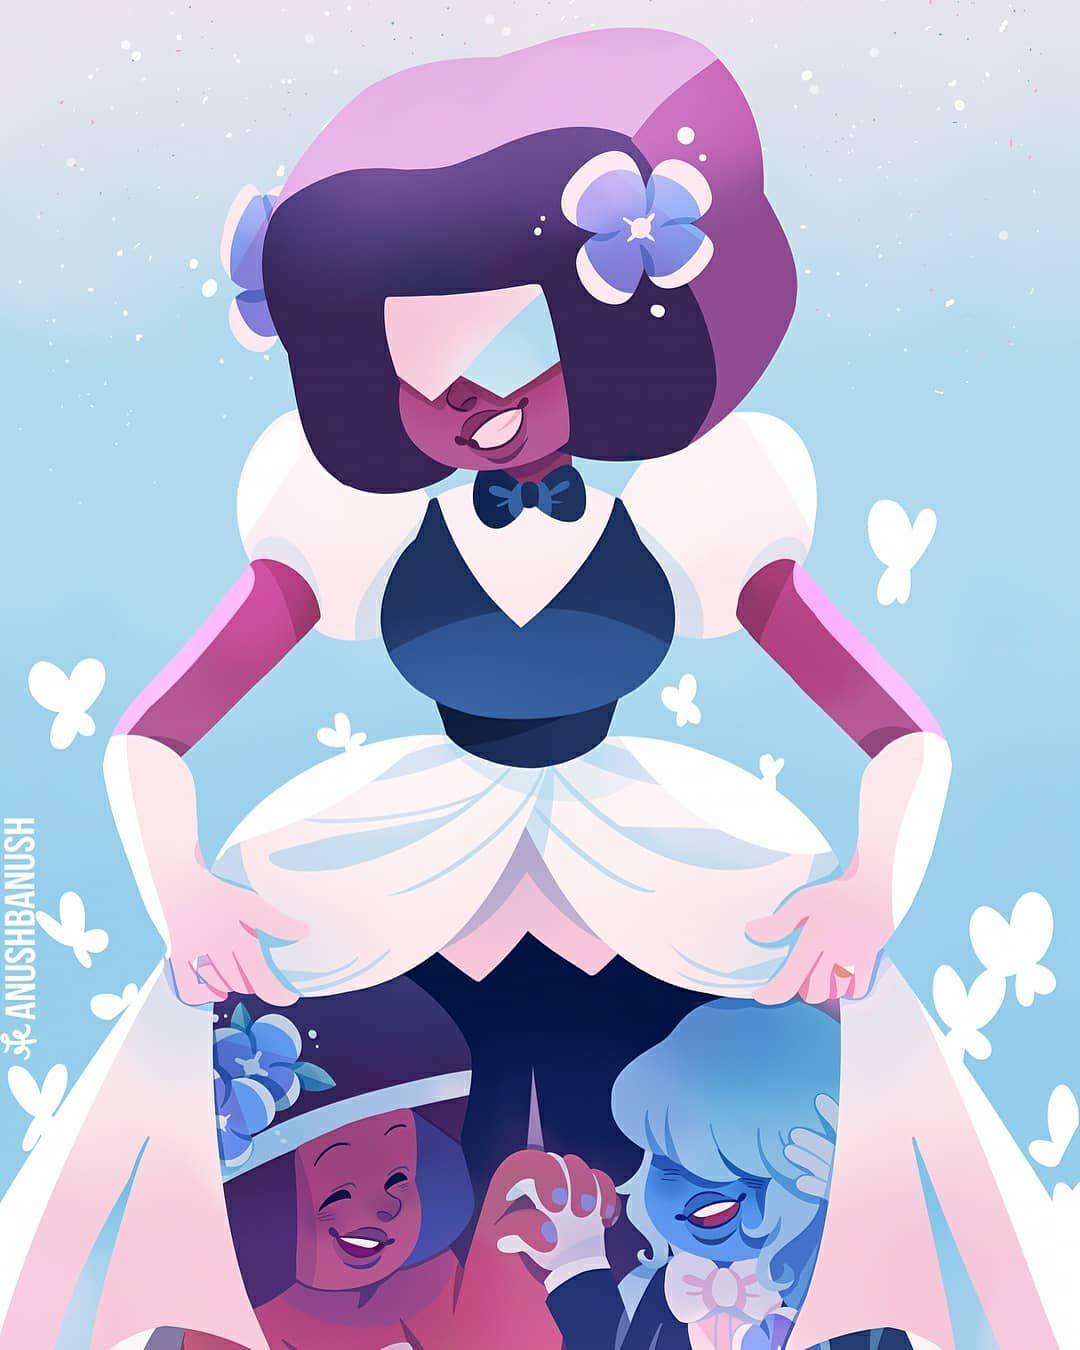 Made Of Love Credit Anushbanush Stevenuniverse Fanart Garnetsu Amet Steven Universe Wallpaper Sapphire Steven Universe Steven Universe Gem